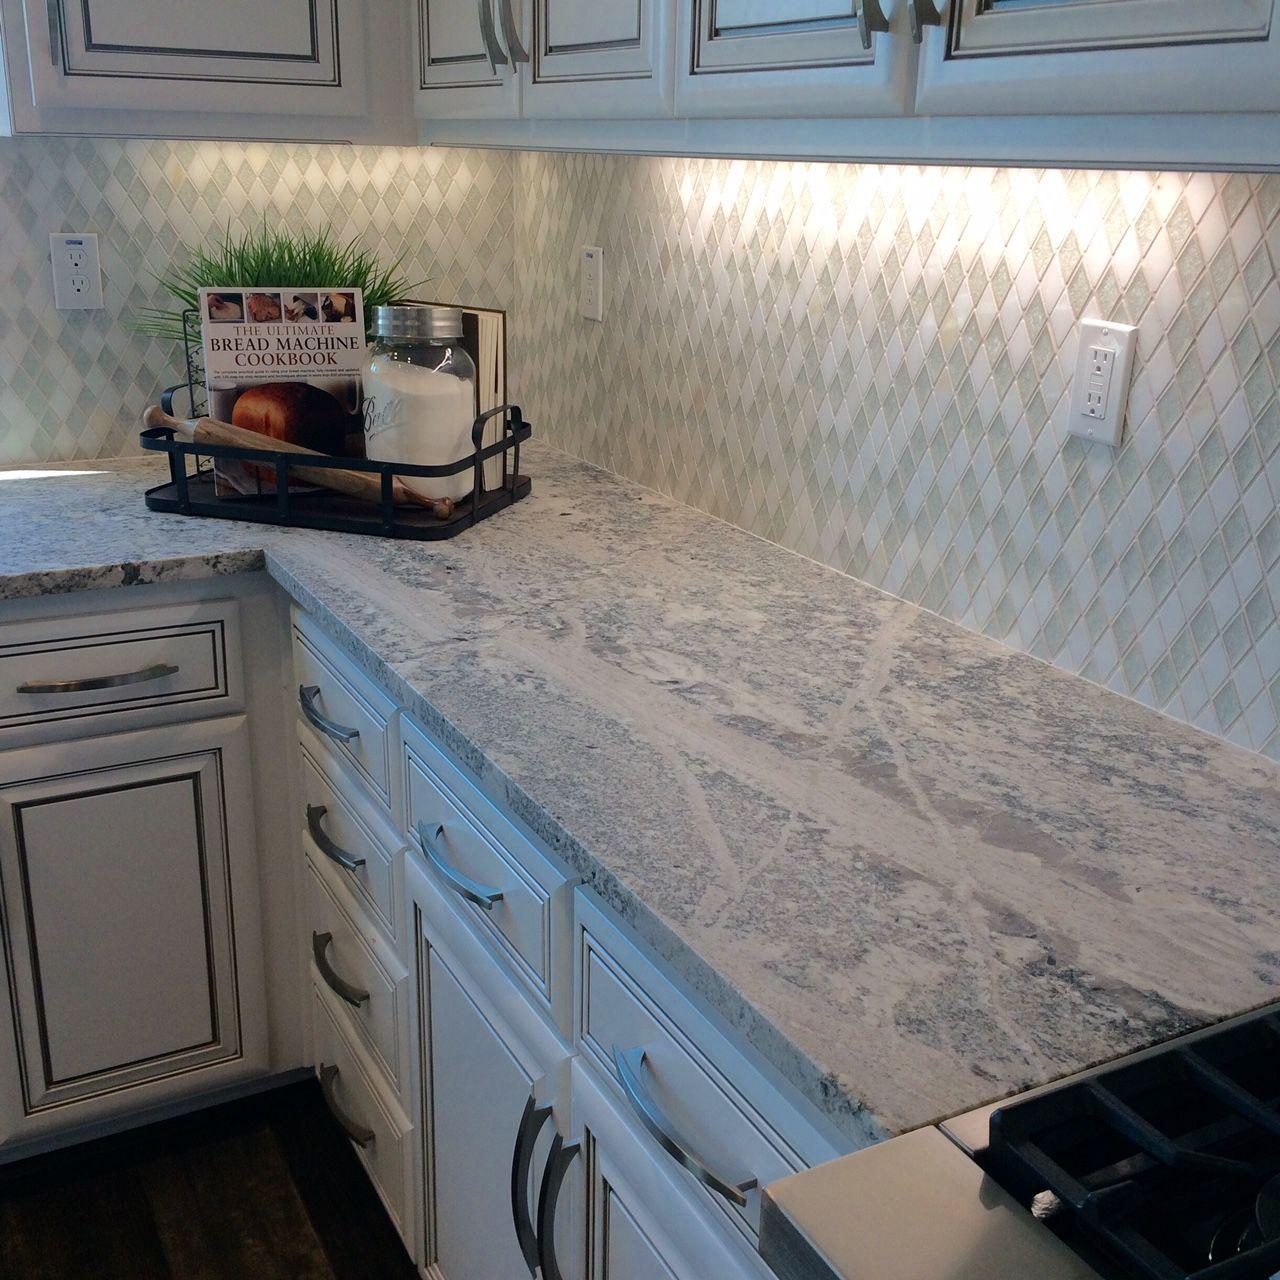 Kitchen Backsplash Tile Types: Pin By Arizona Tile On Gorgeous Granite